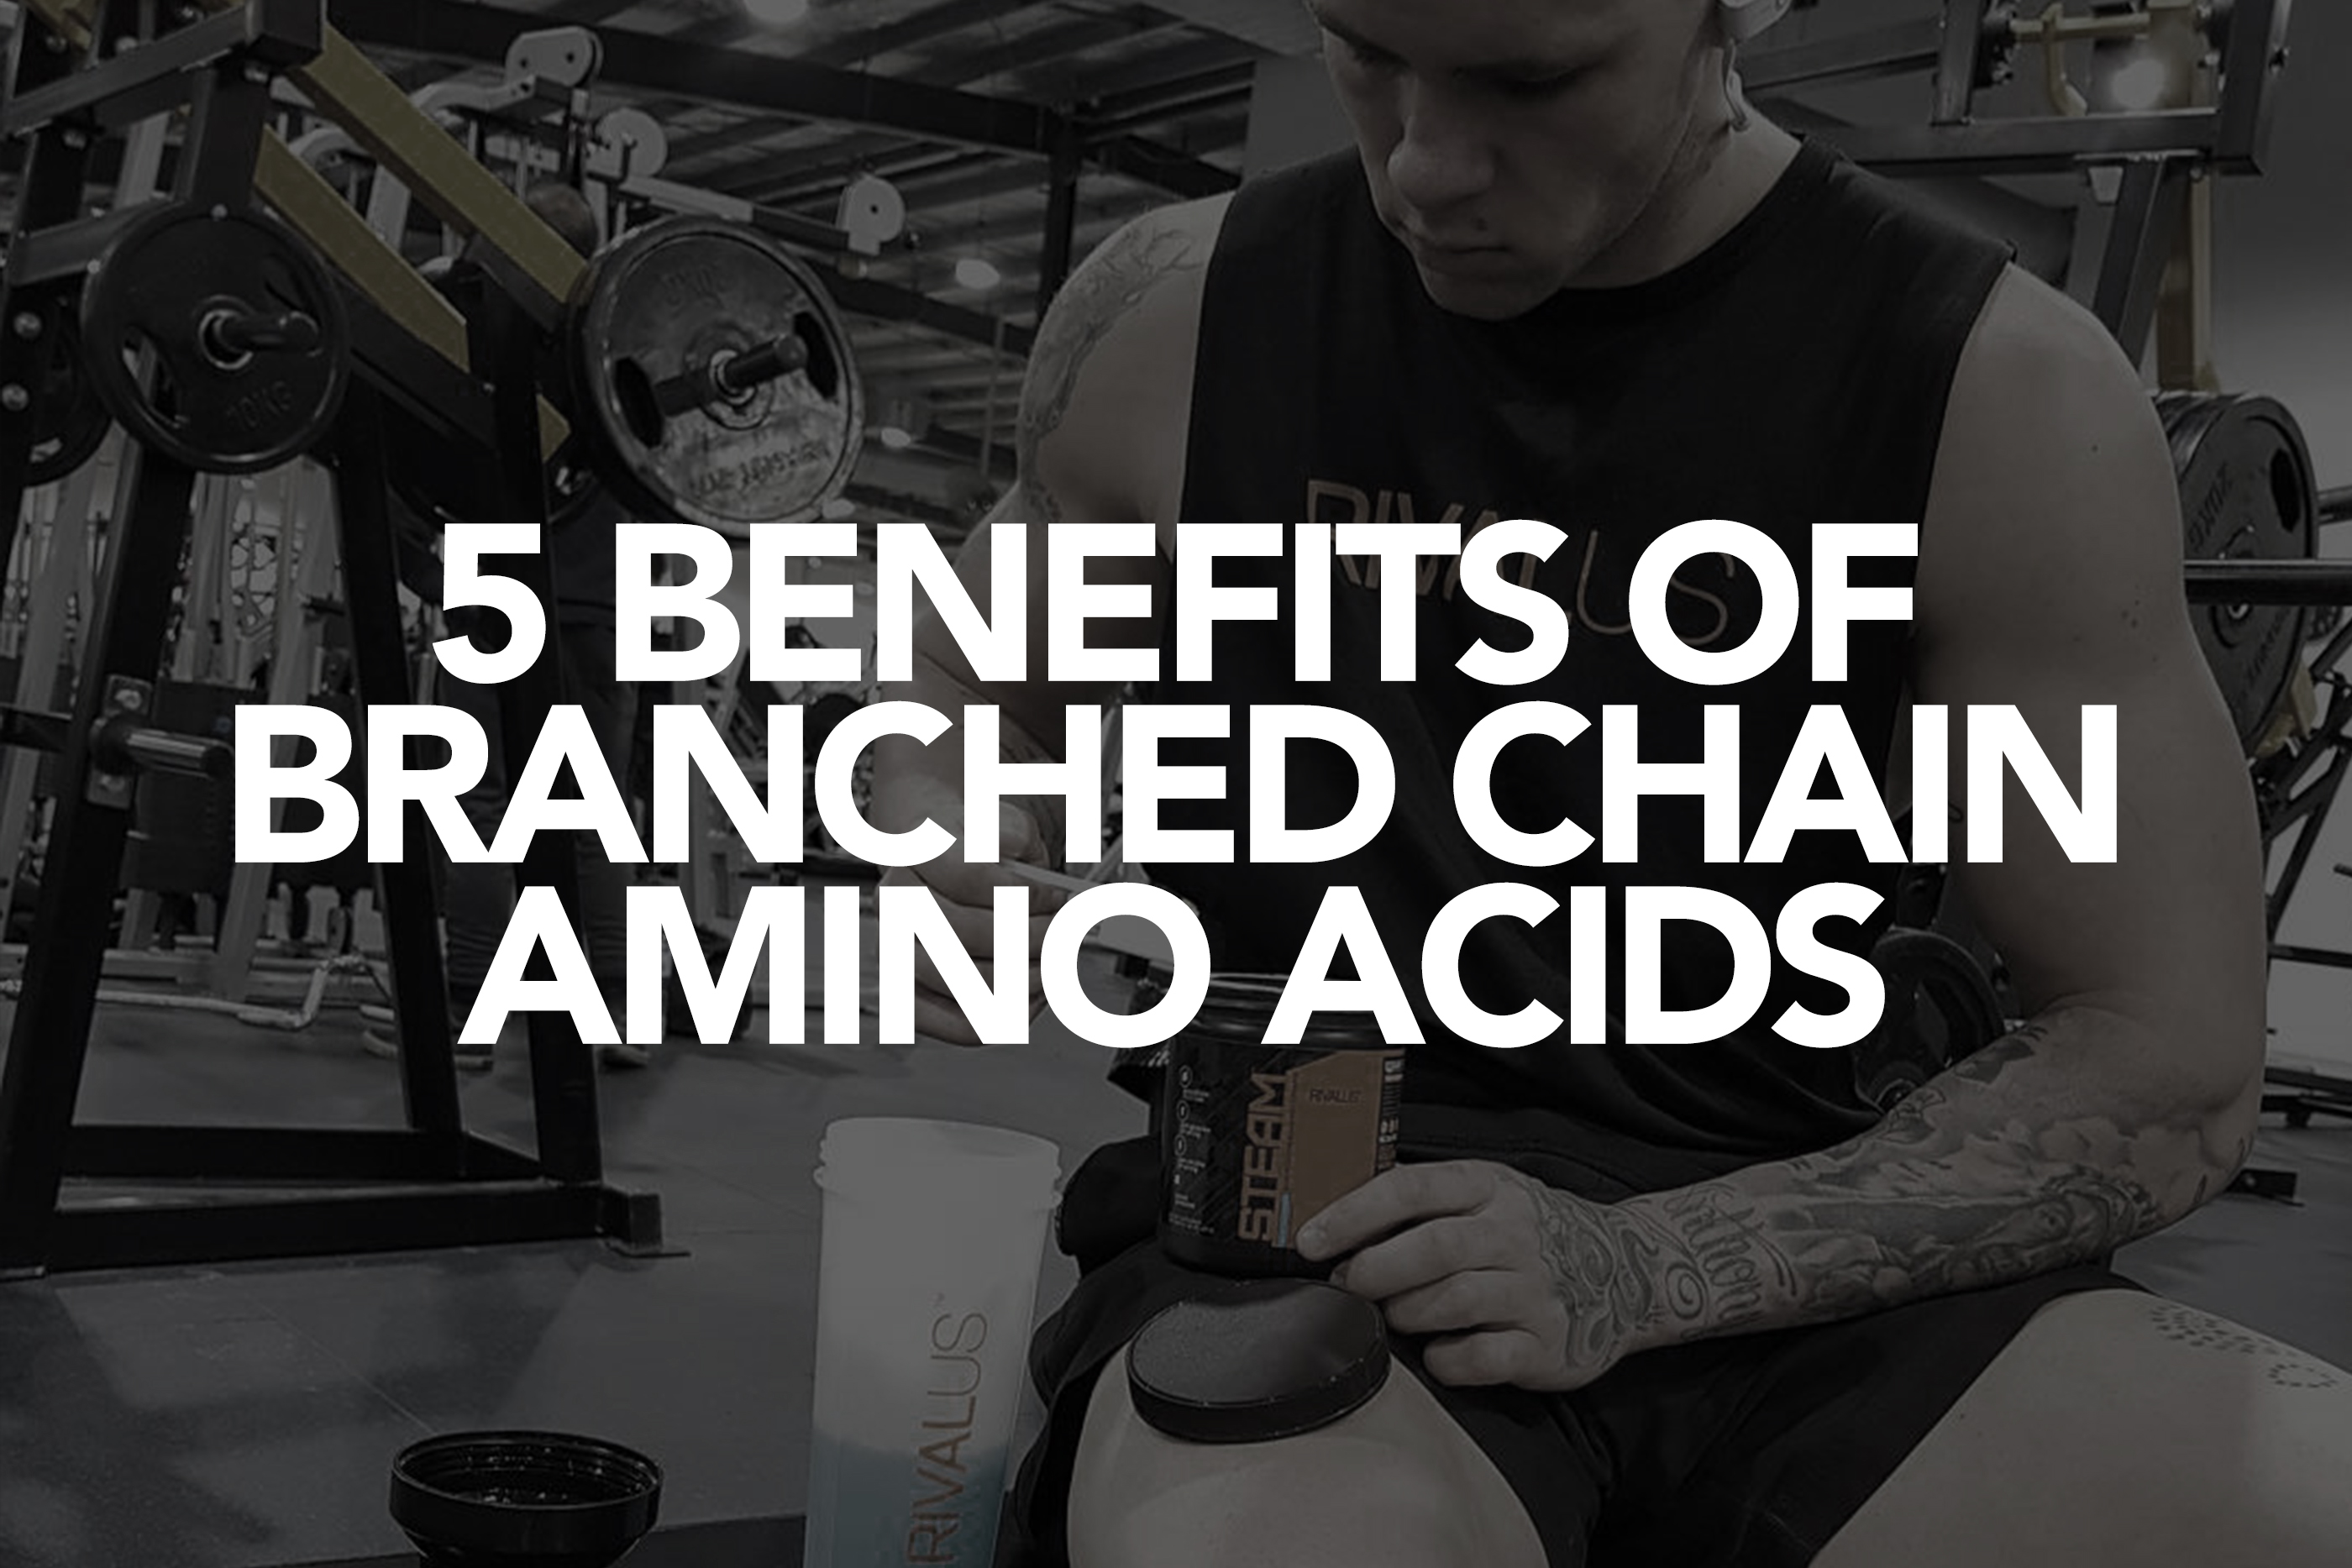 5 Benefits of BCAAs